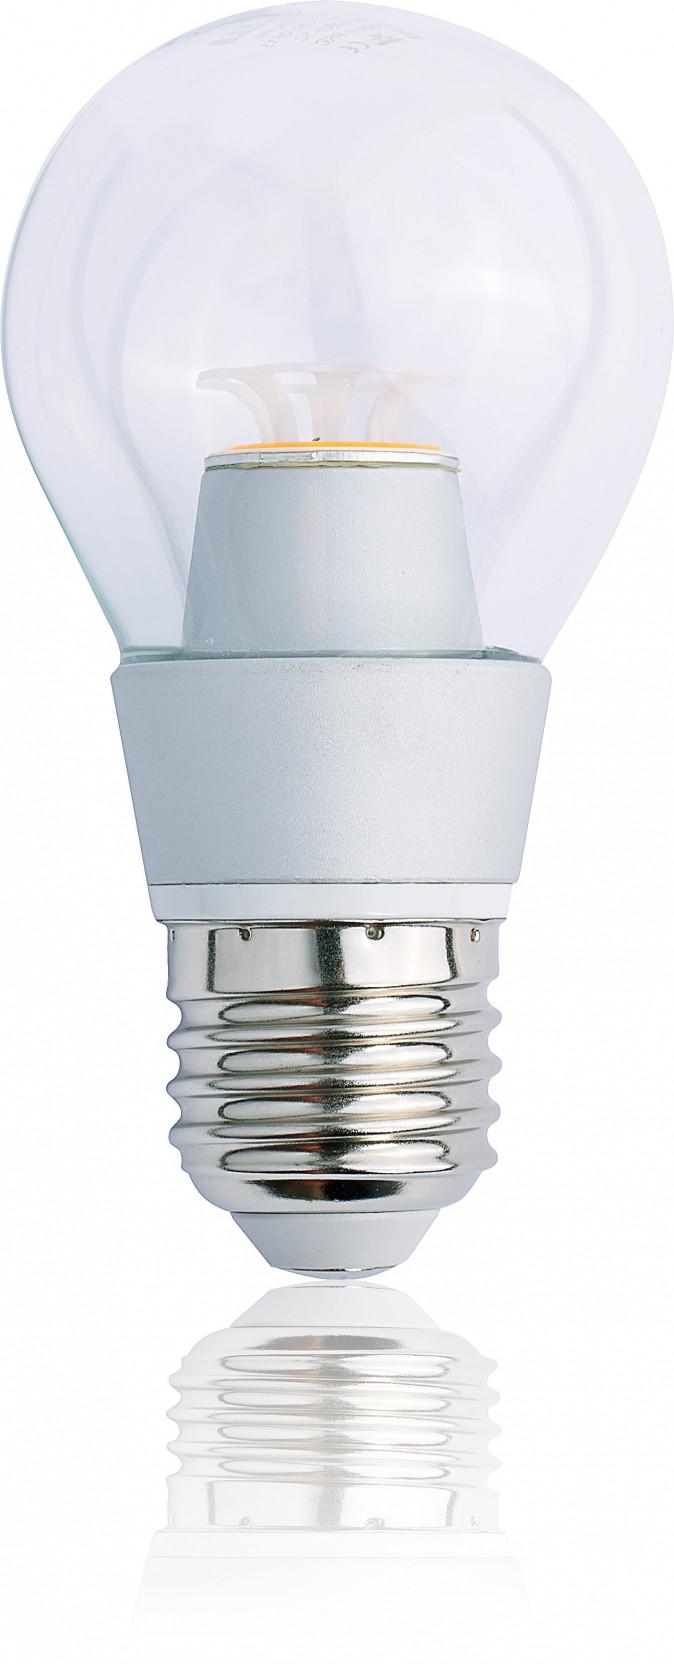 TESLA LED BULB 5W E27